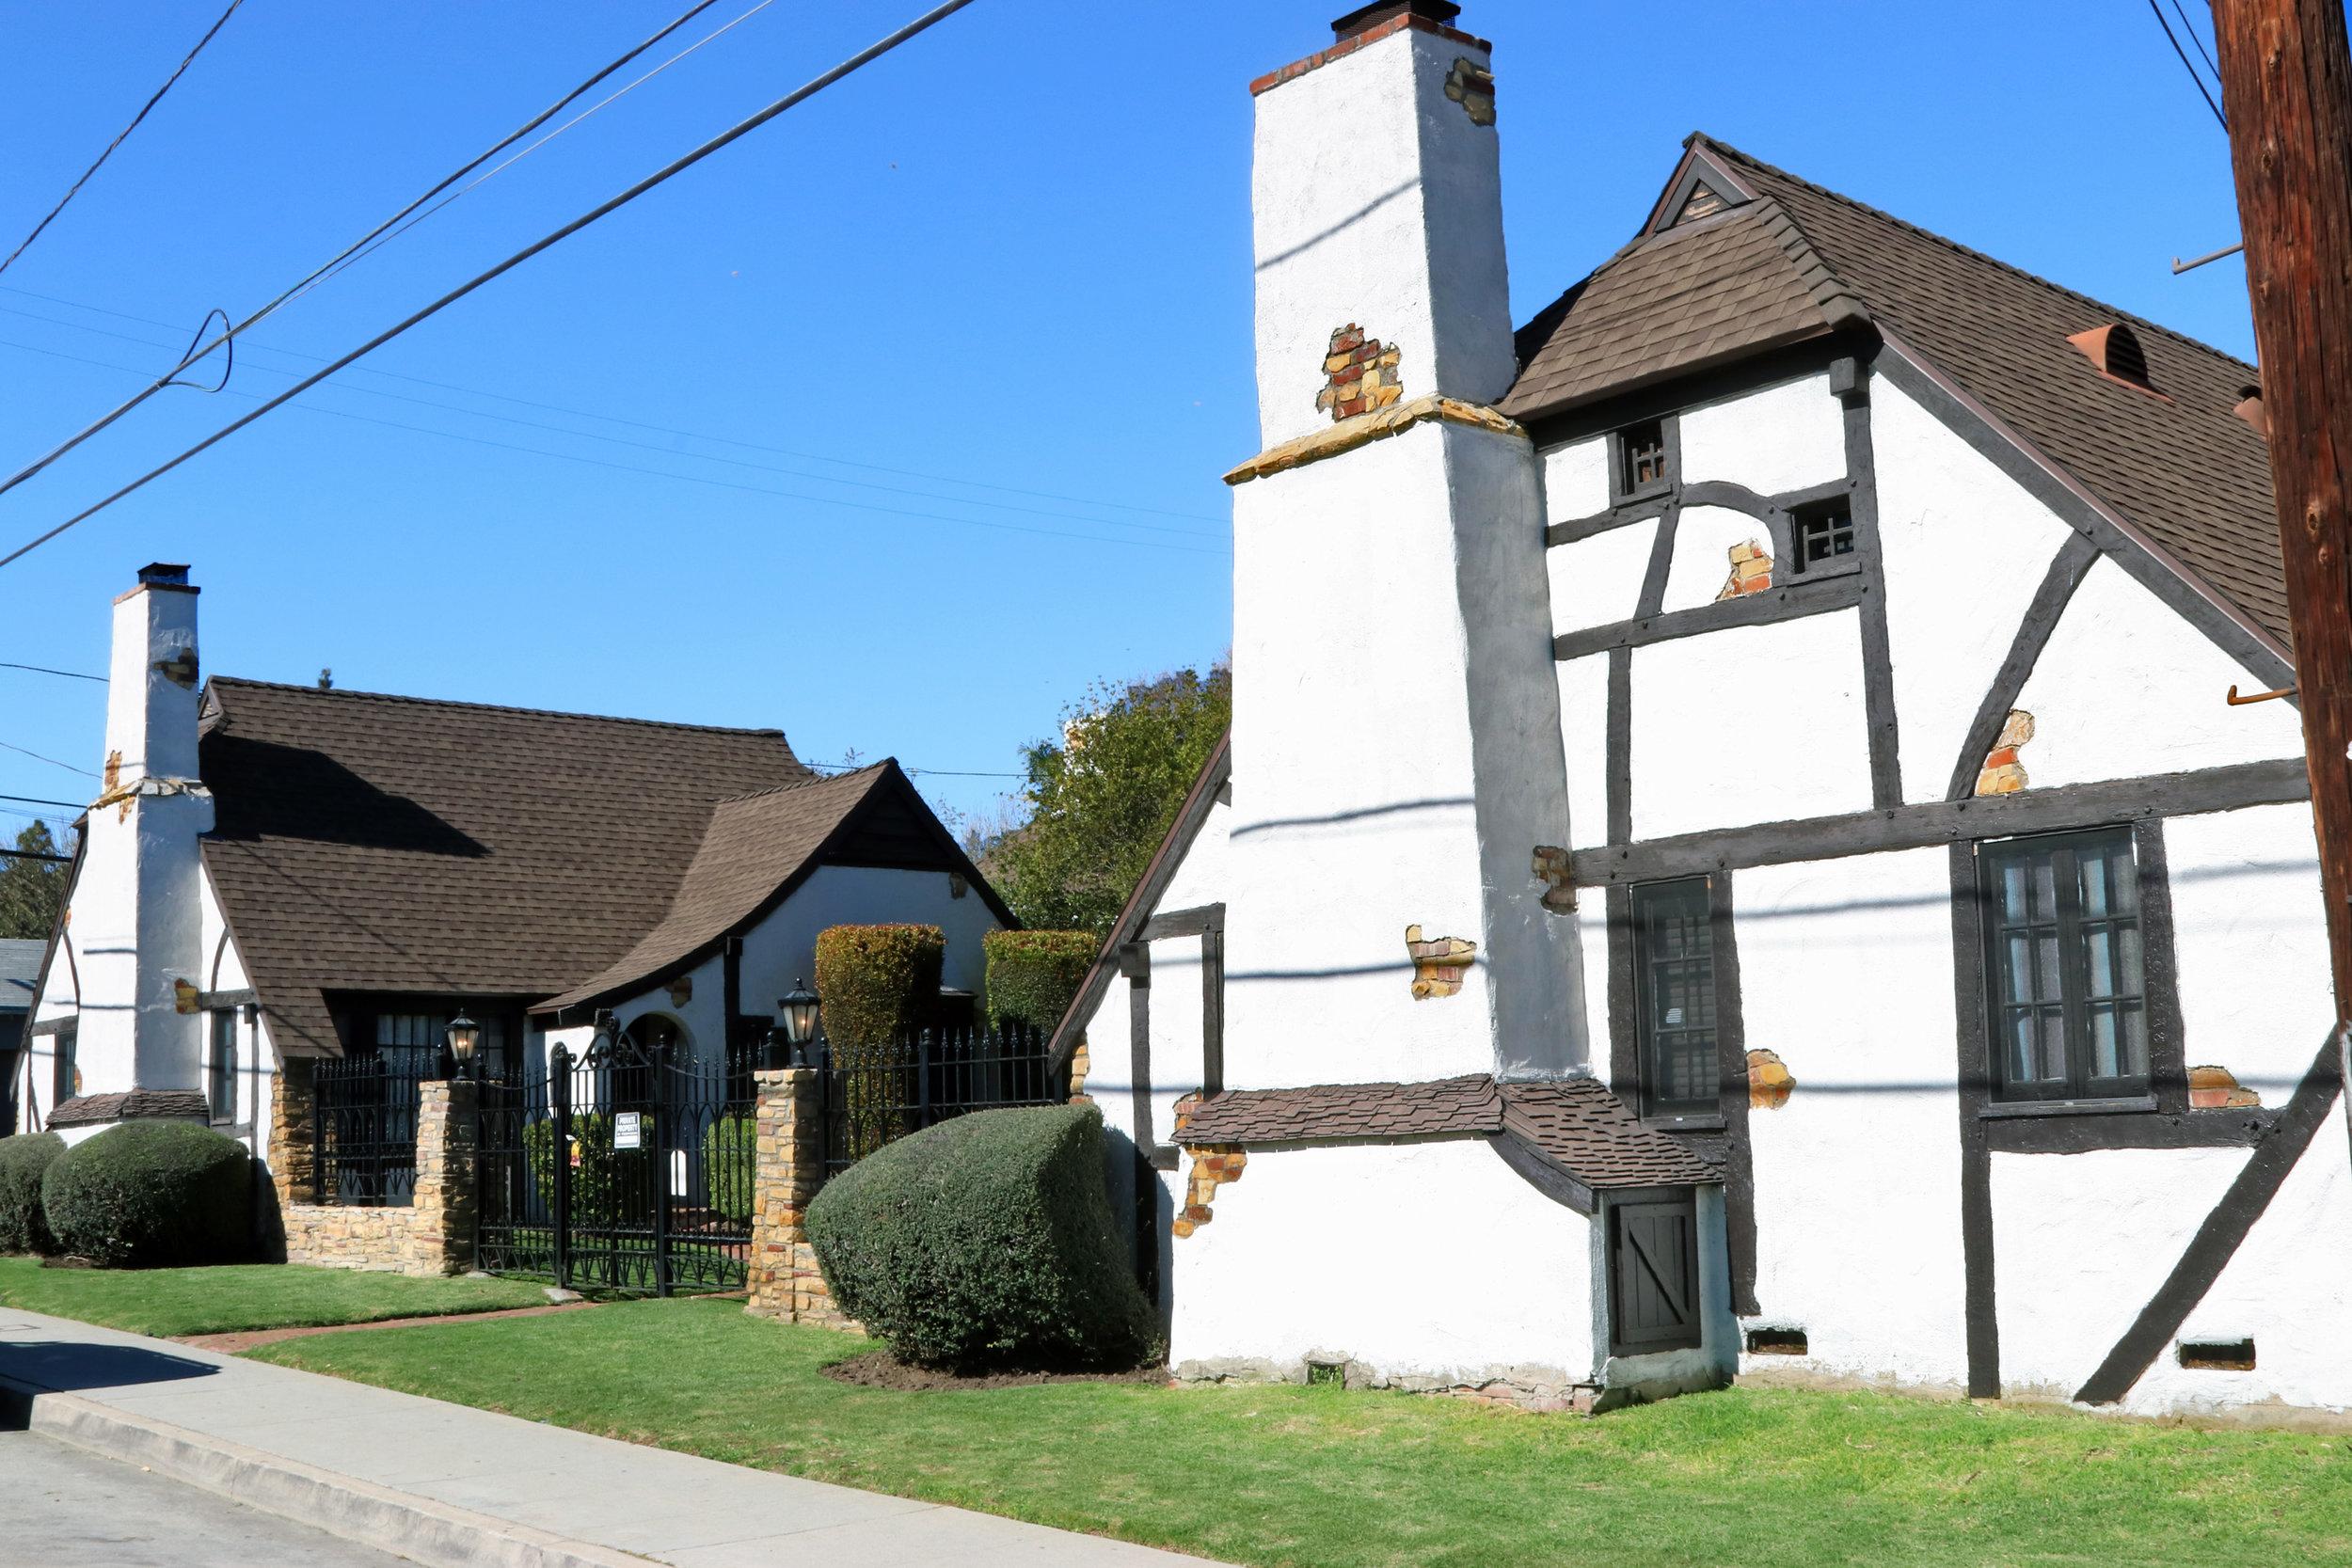 Snow White Cottages    Ben Sherwood - 1931